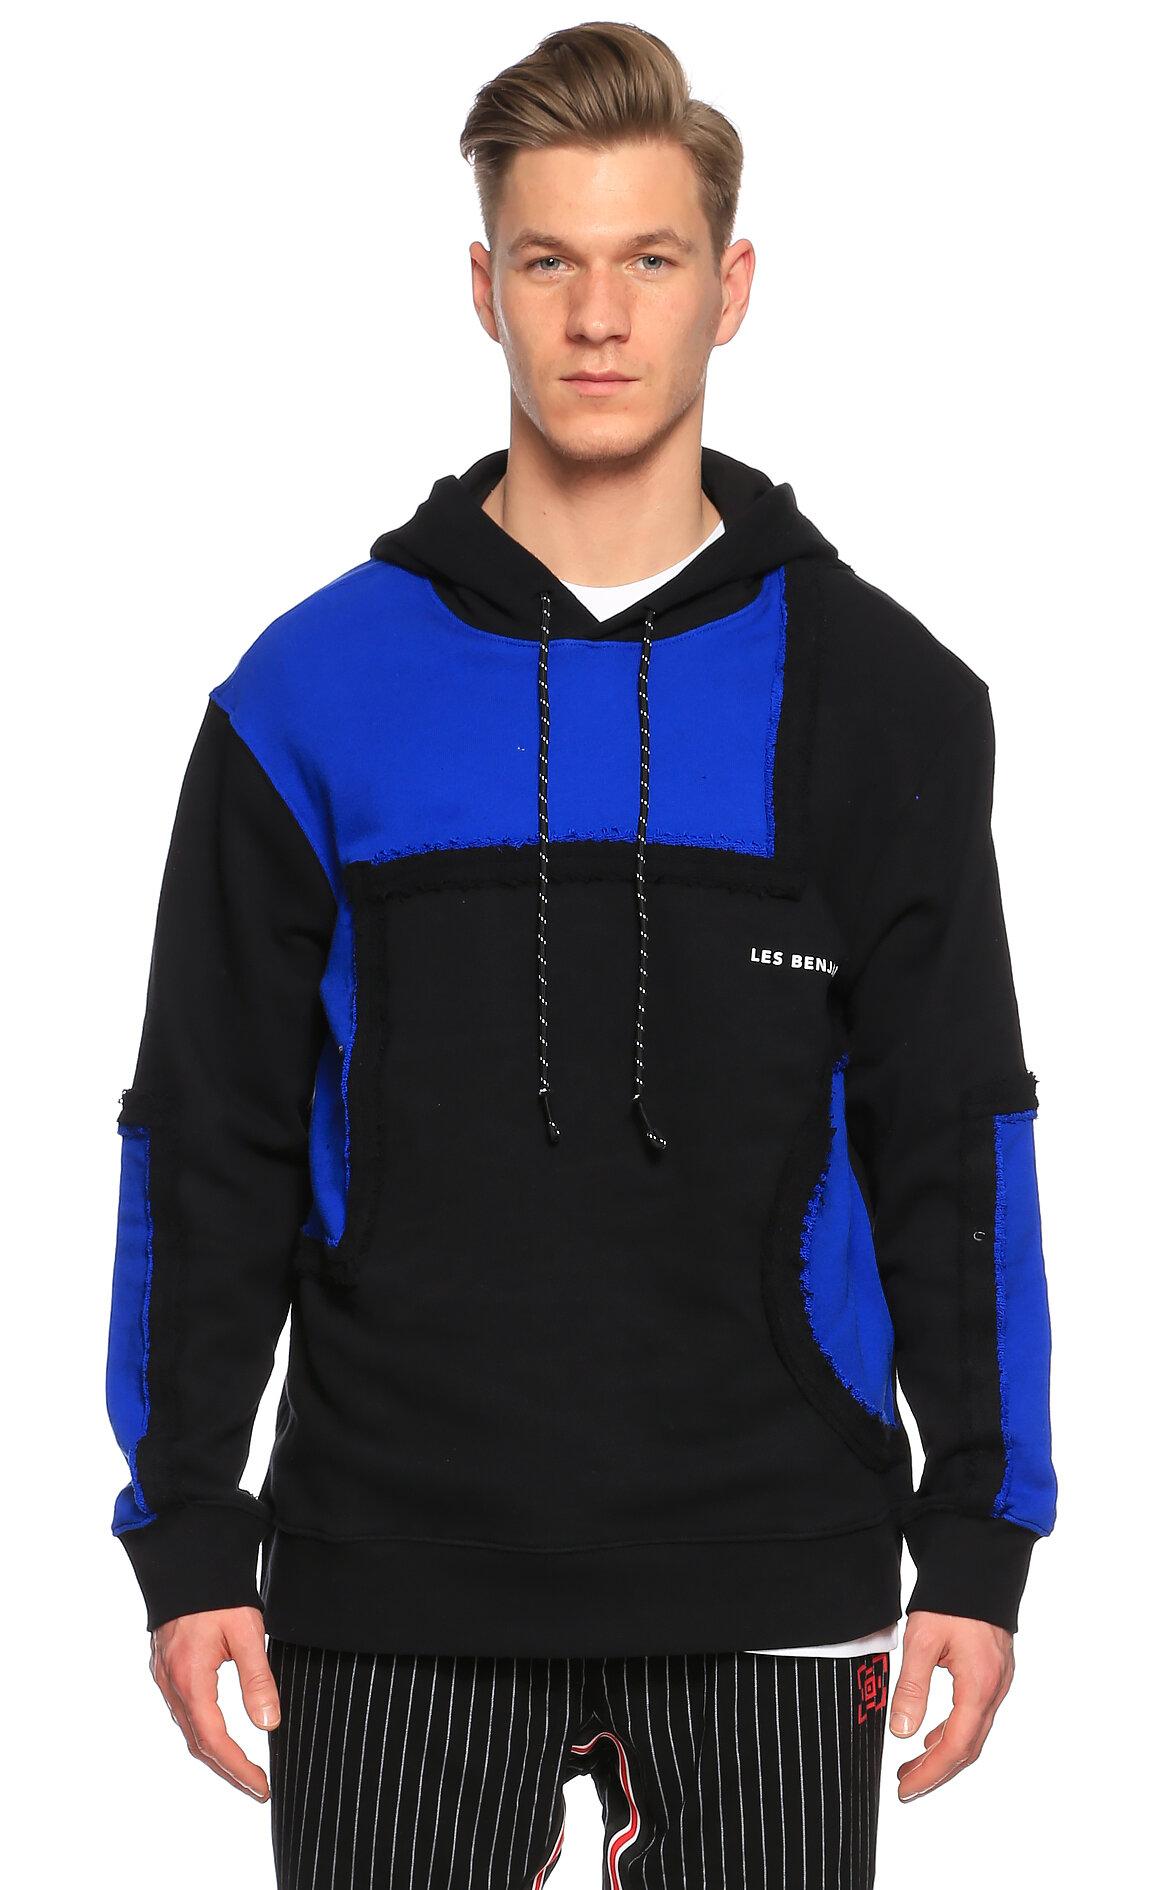 Les Benjamins-Les Benjamins Kapüşonlu Siyah - Lacivert Sweatshirt